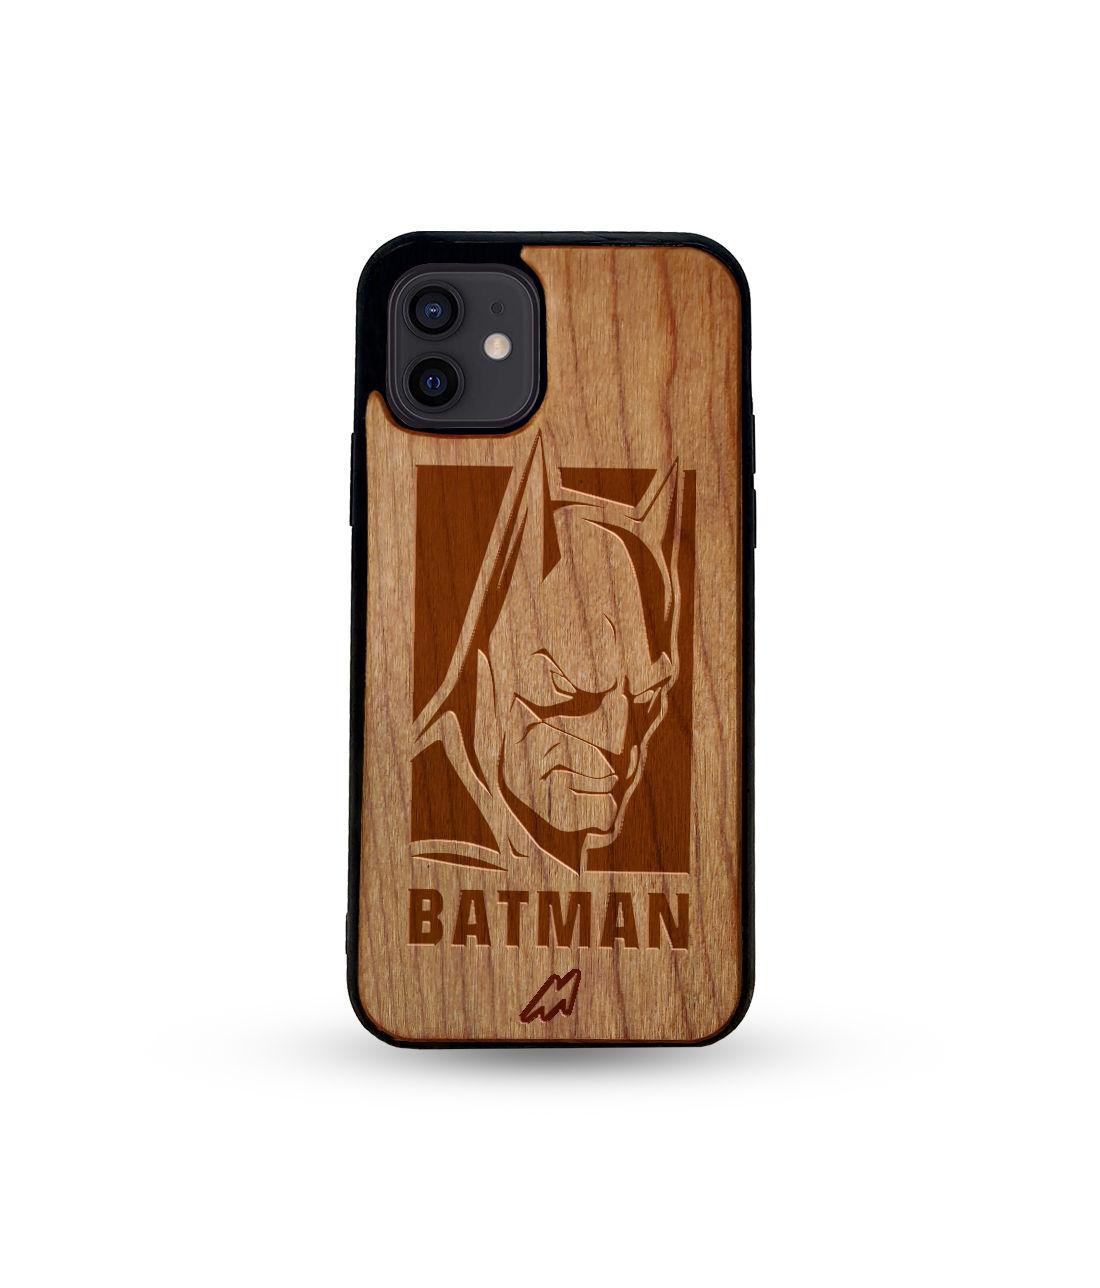 Batman Stare - Honey Maple Wooden Phone Case for iPhone 12